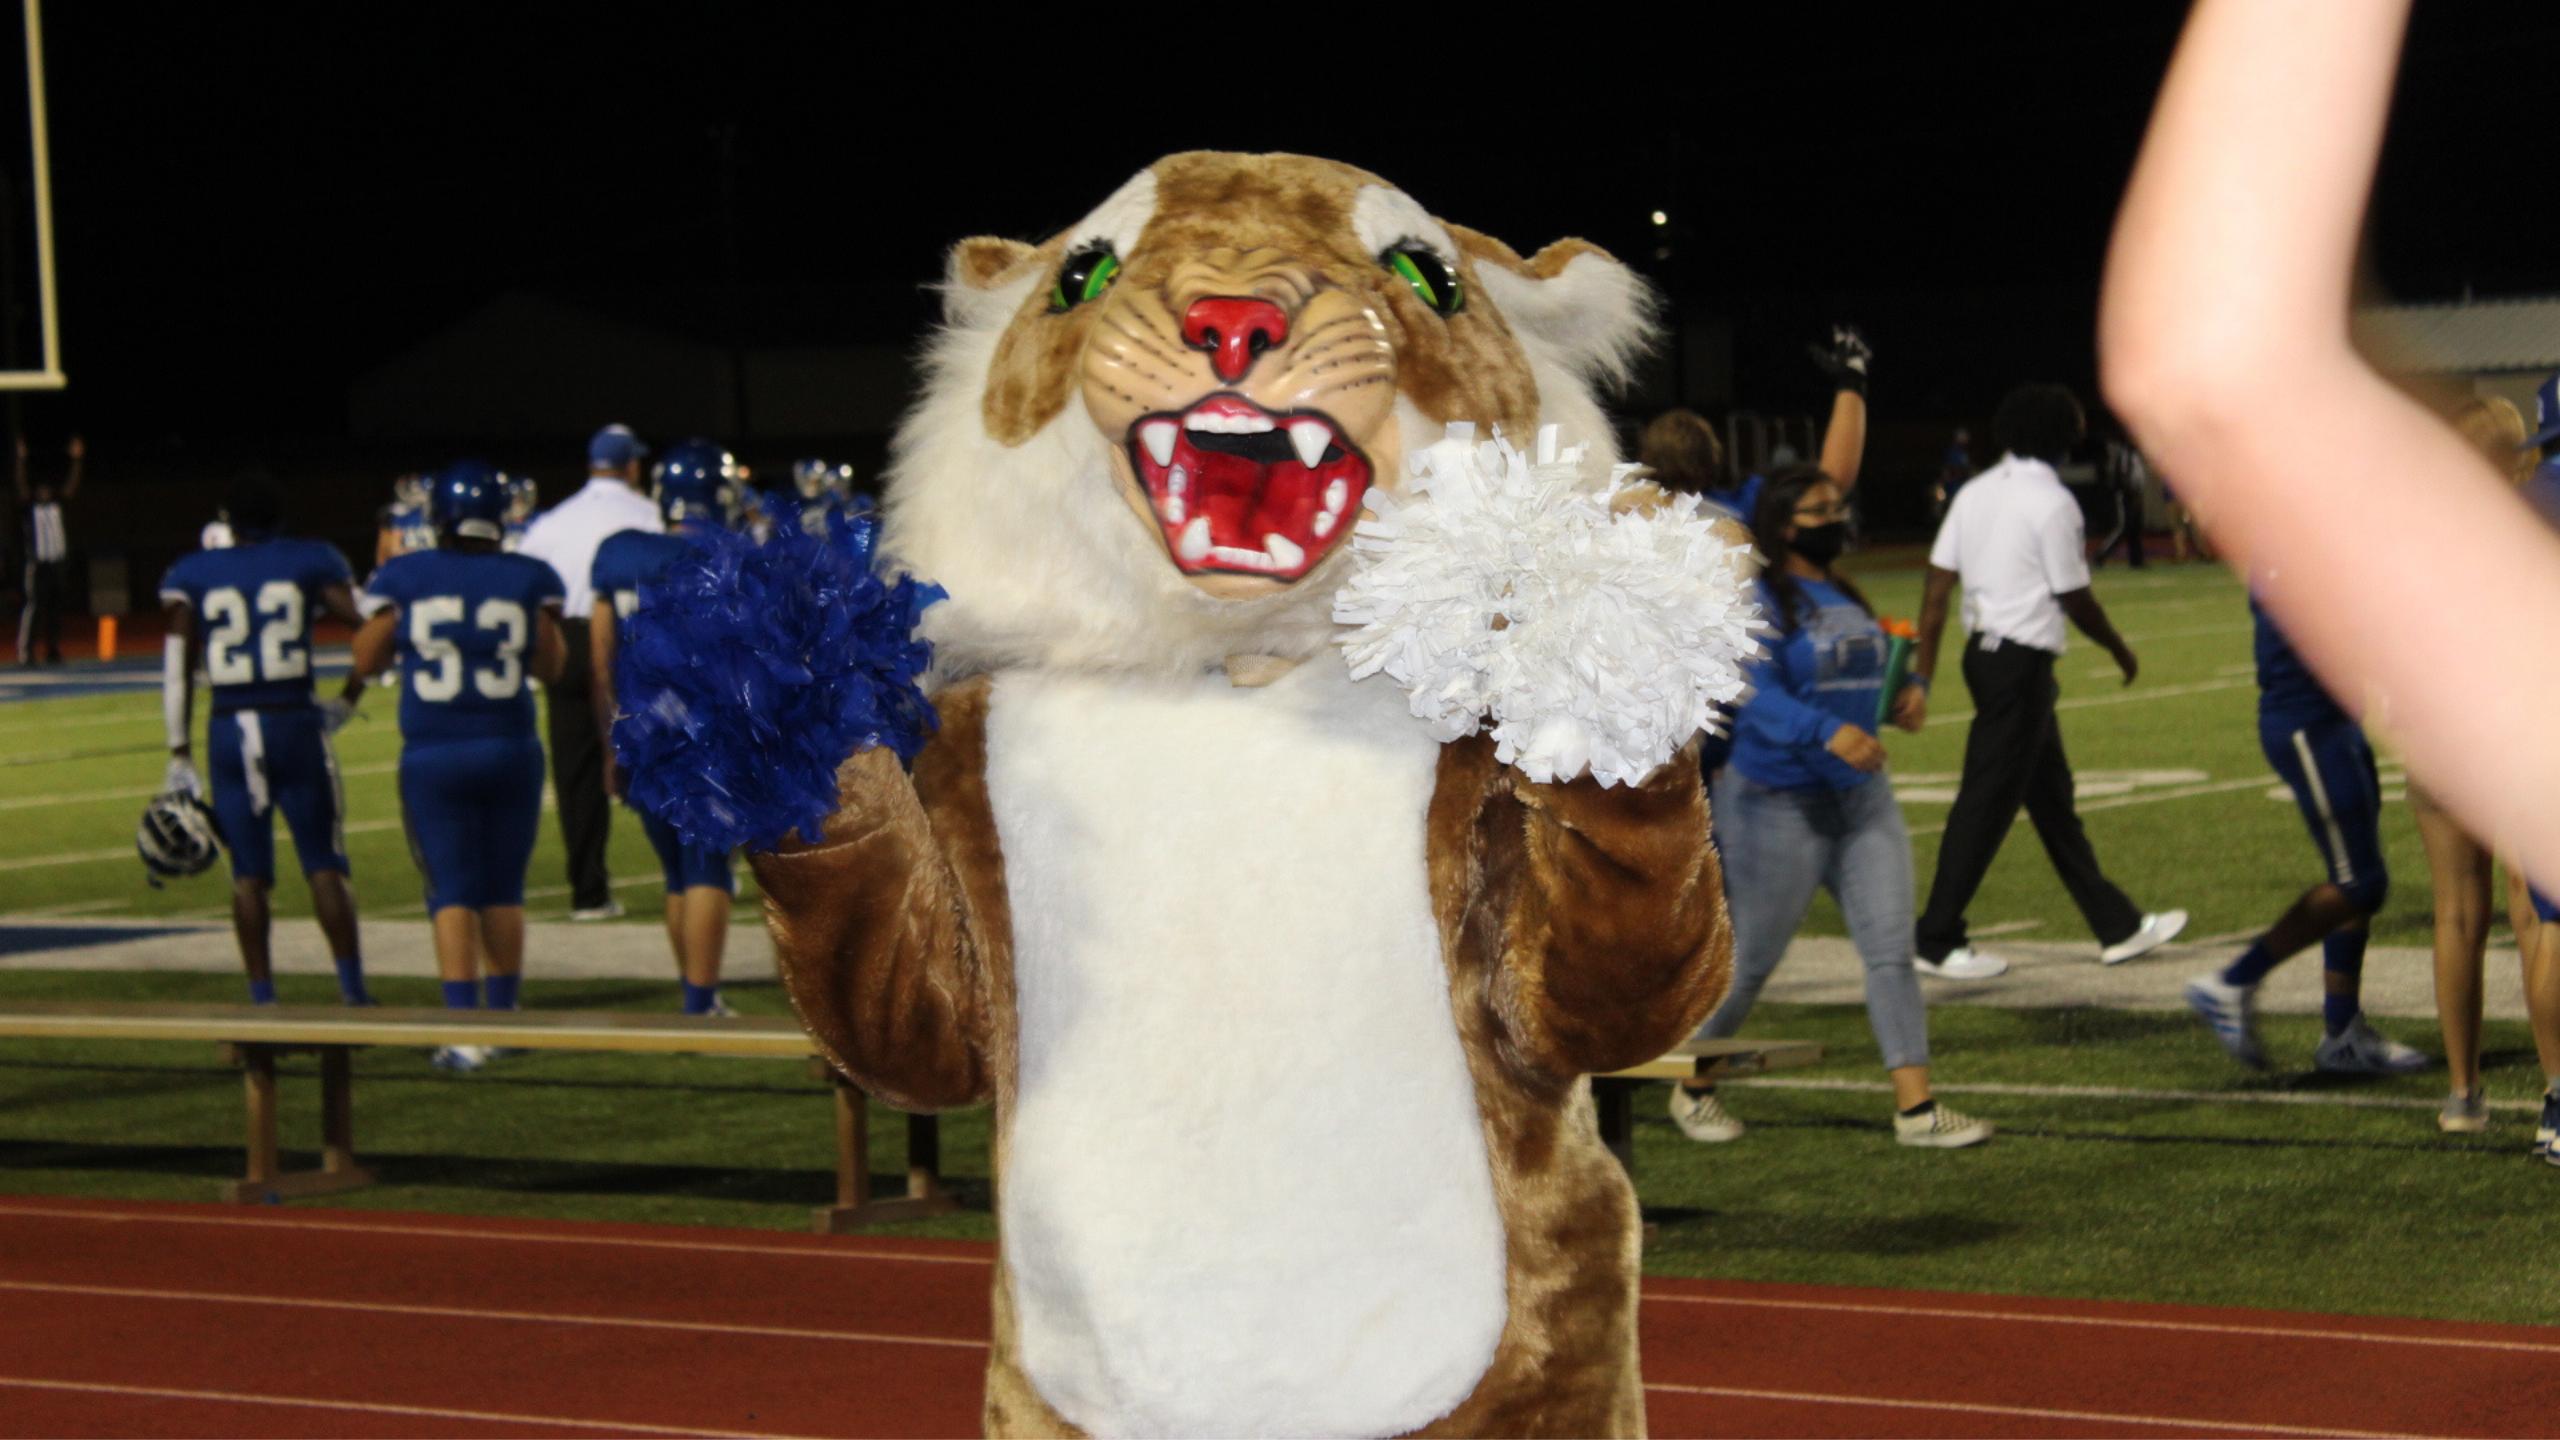 wildcat mascot cheering on the sidelines